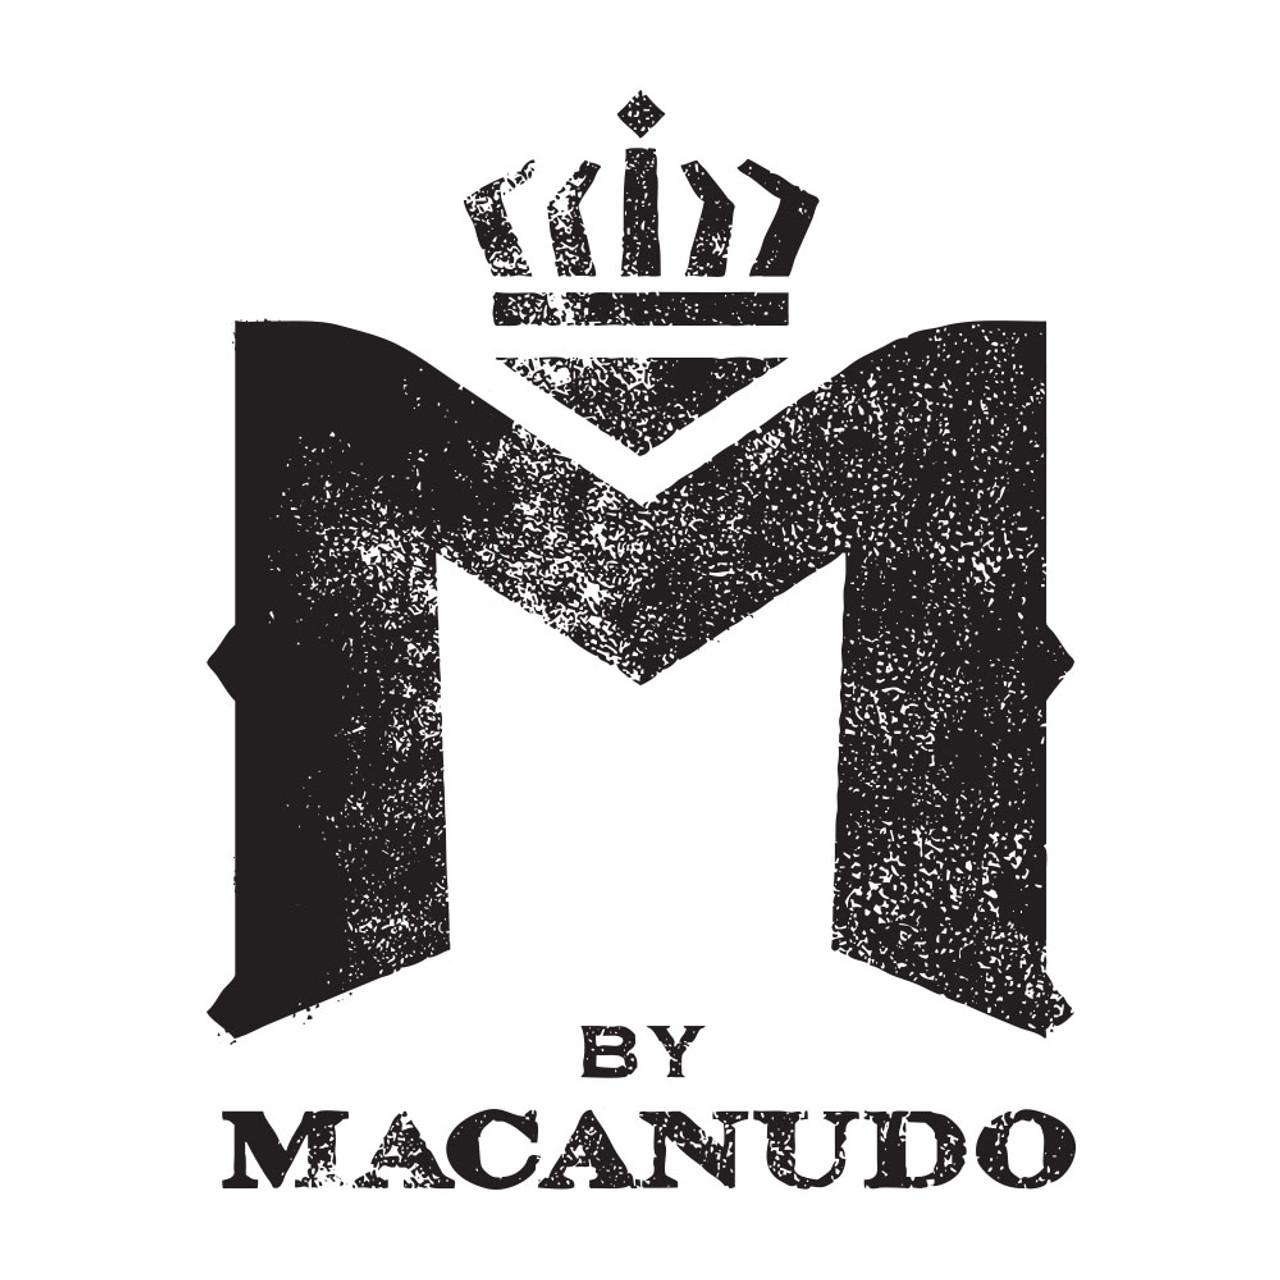 Macanudo M Belicoso Cigars - 6 x 54 (Box of 20)